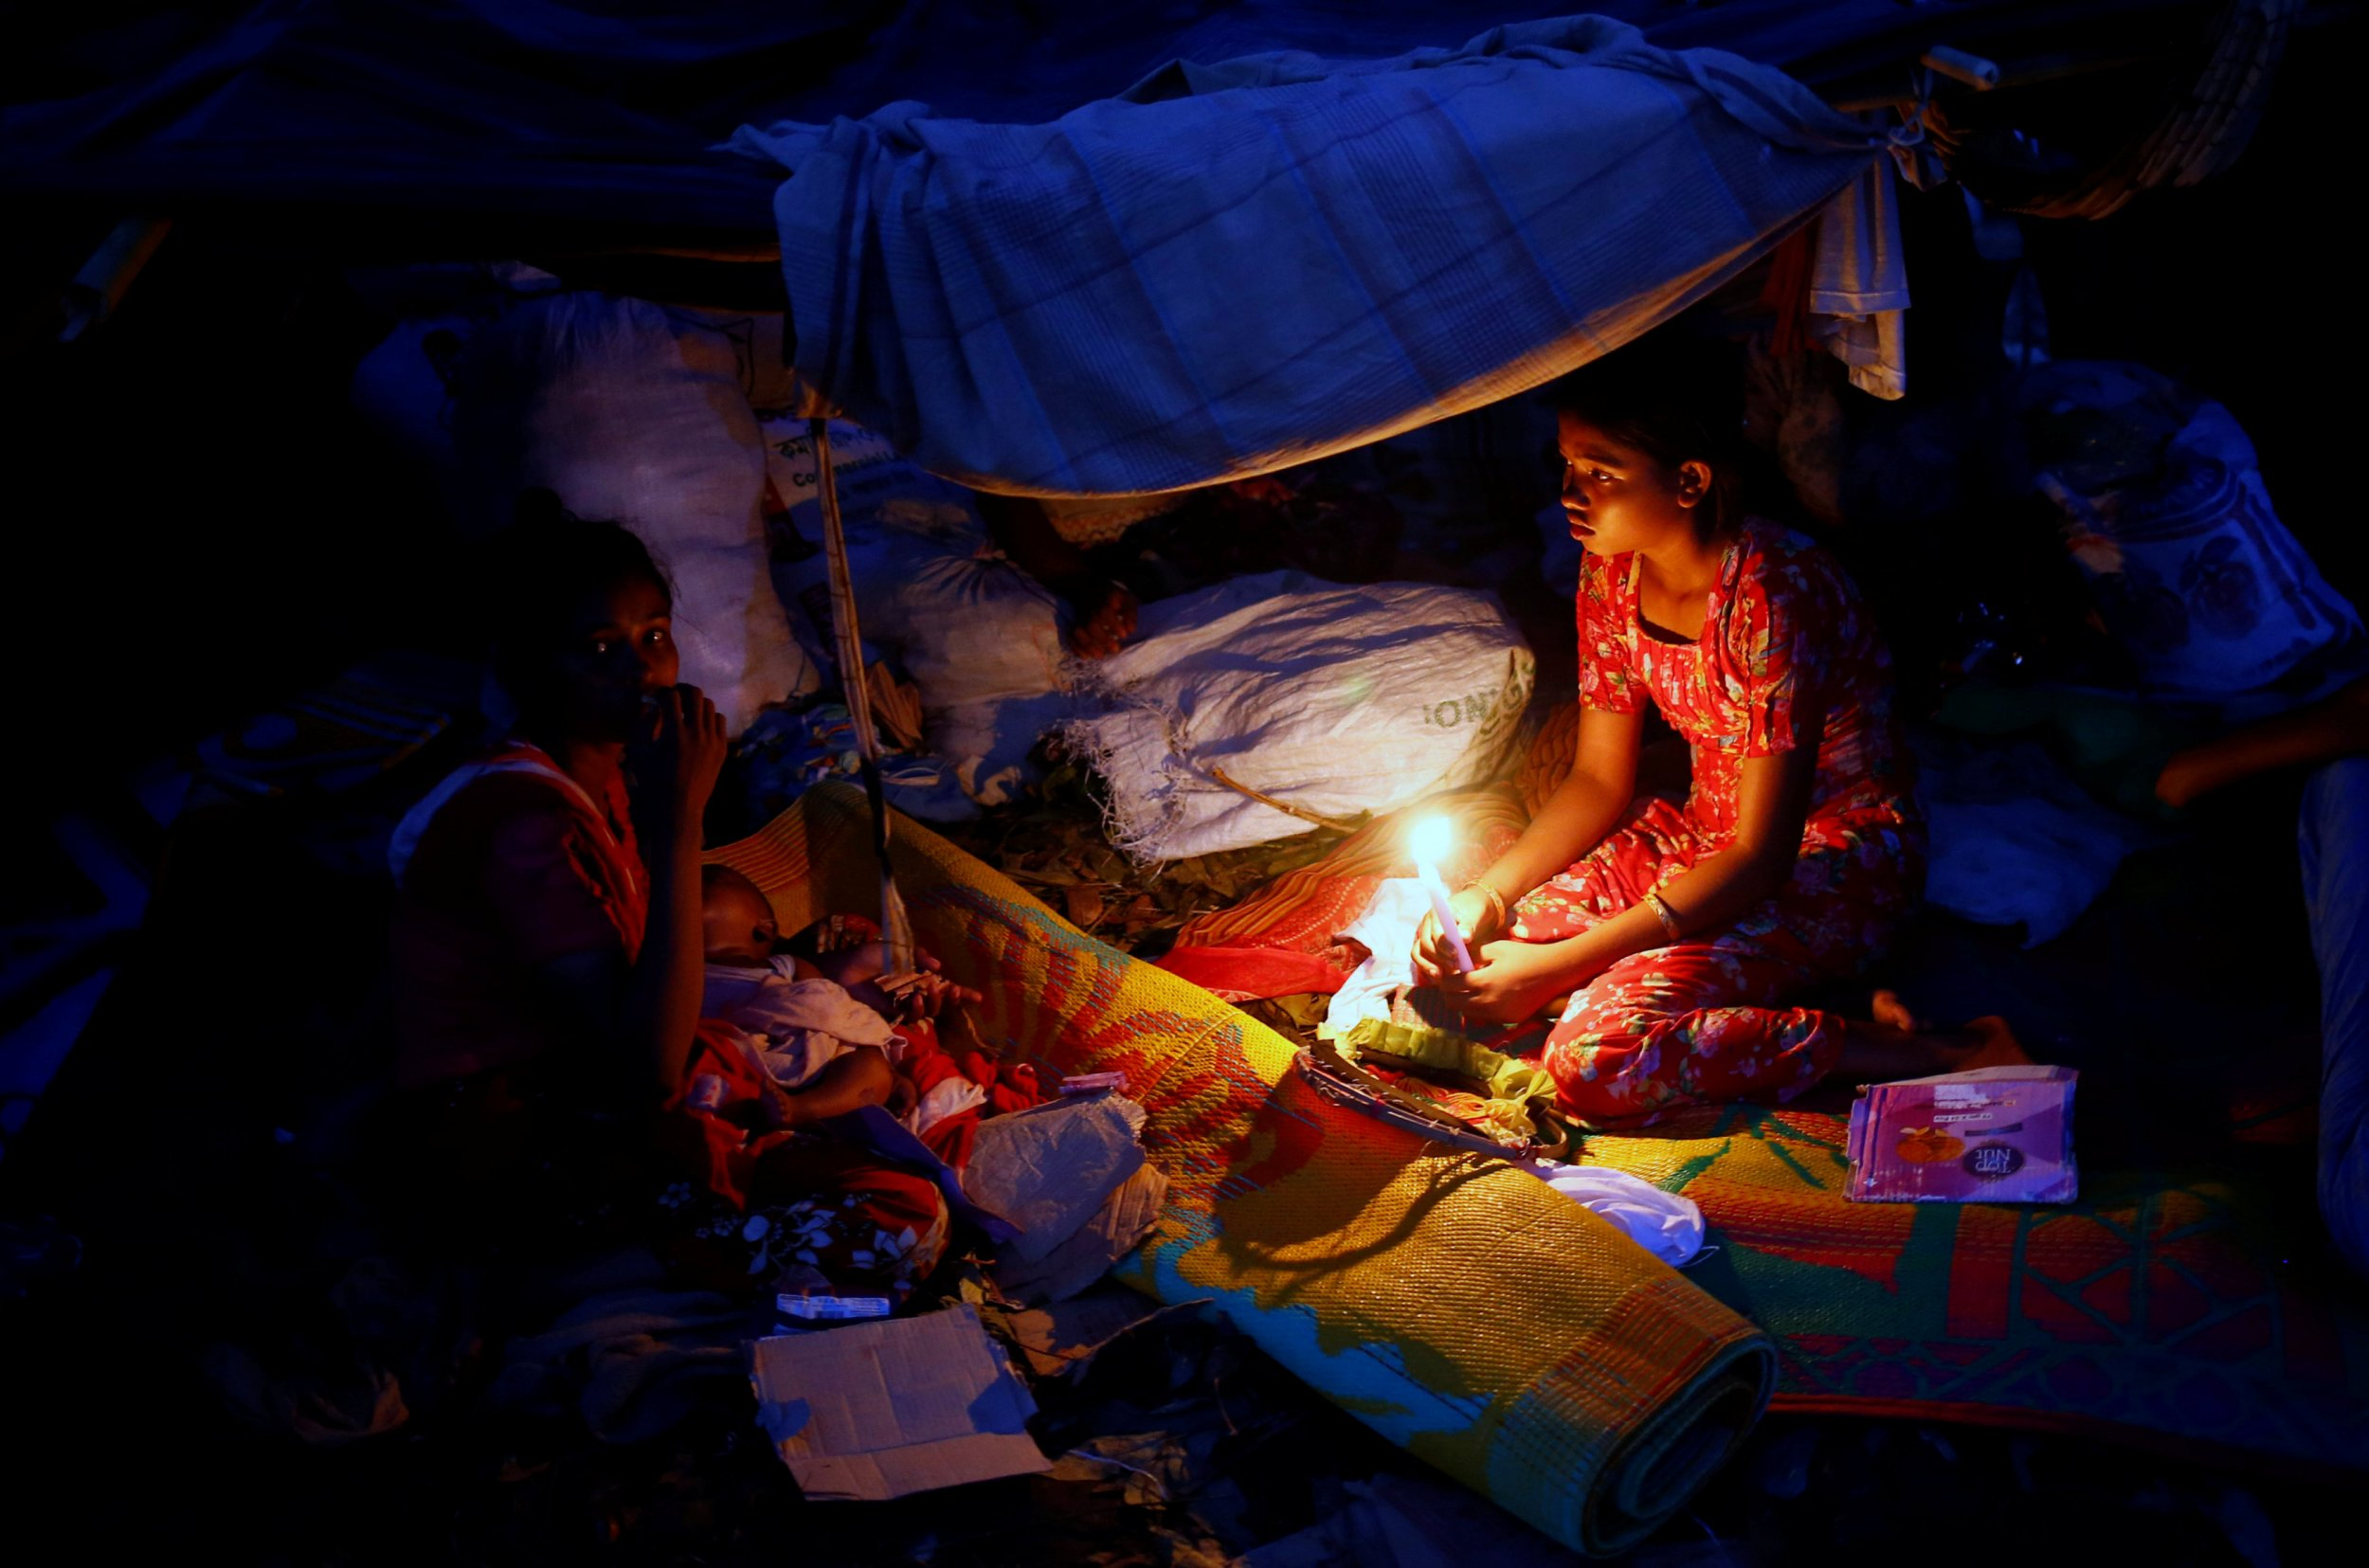 2017-09-17T062415Z_1_LYNXNPED8G07M_RTROPTP_4_MYANMAR-ROHINGYA-BANGLADESH